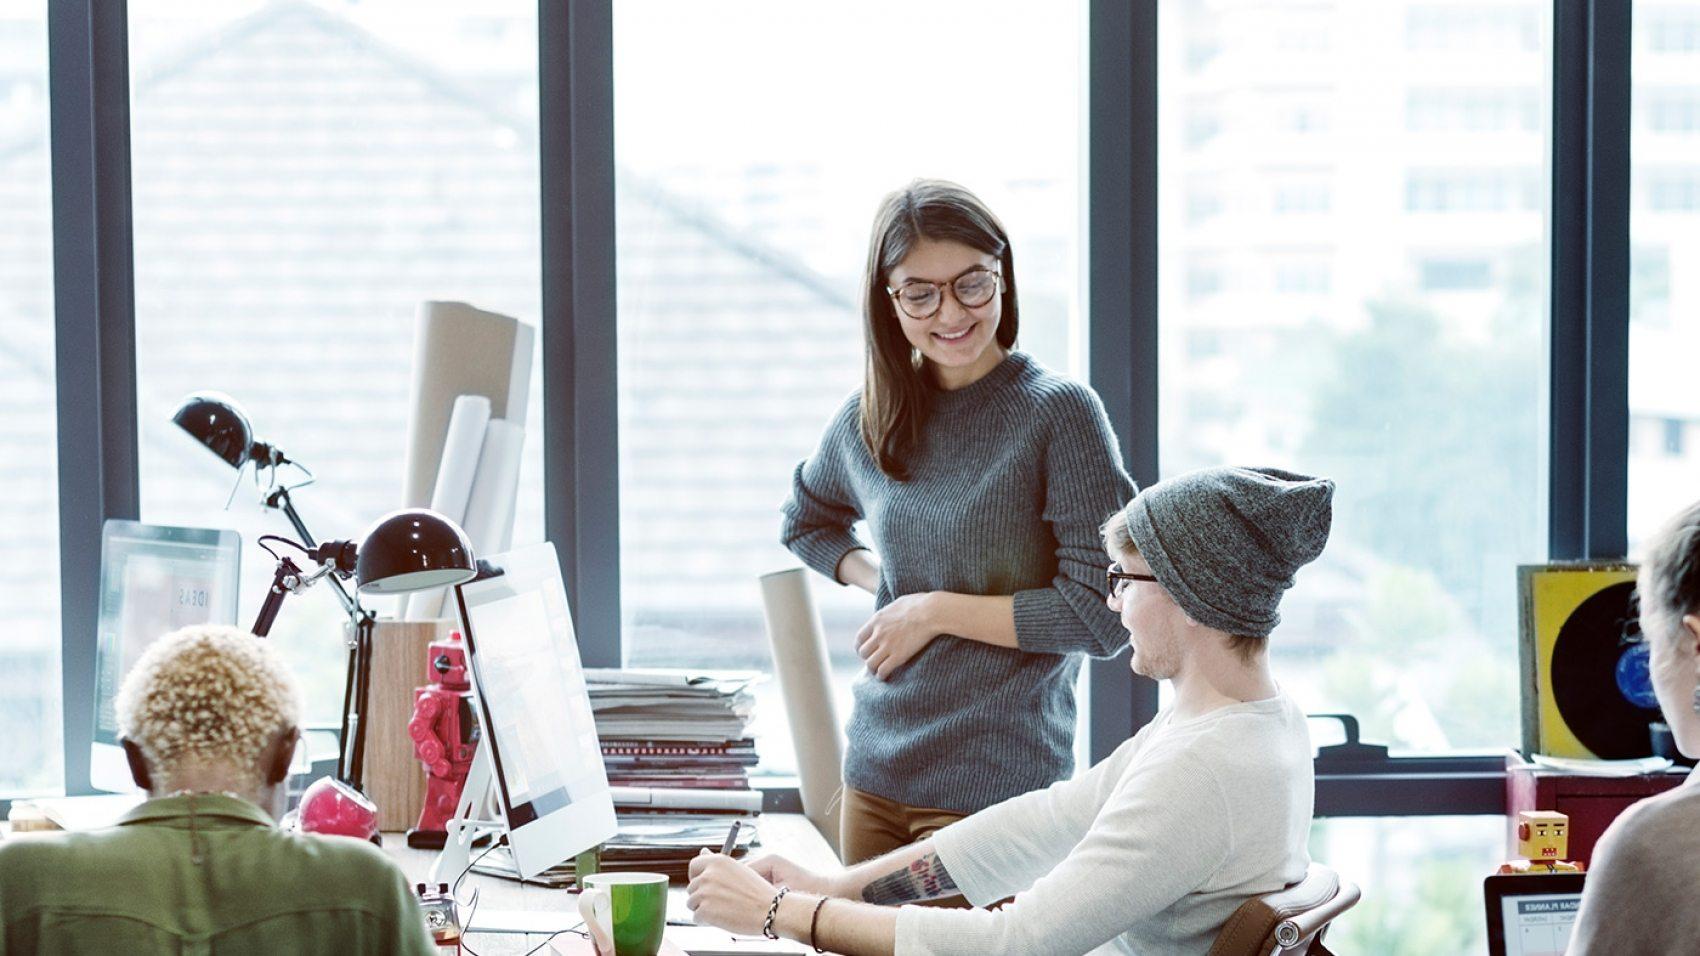 teamwork-discussion-meeting-brainstorming-start-PUVTFTU